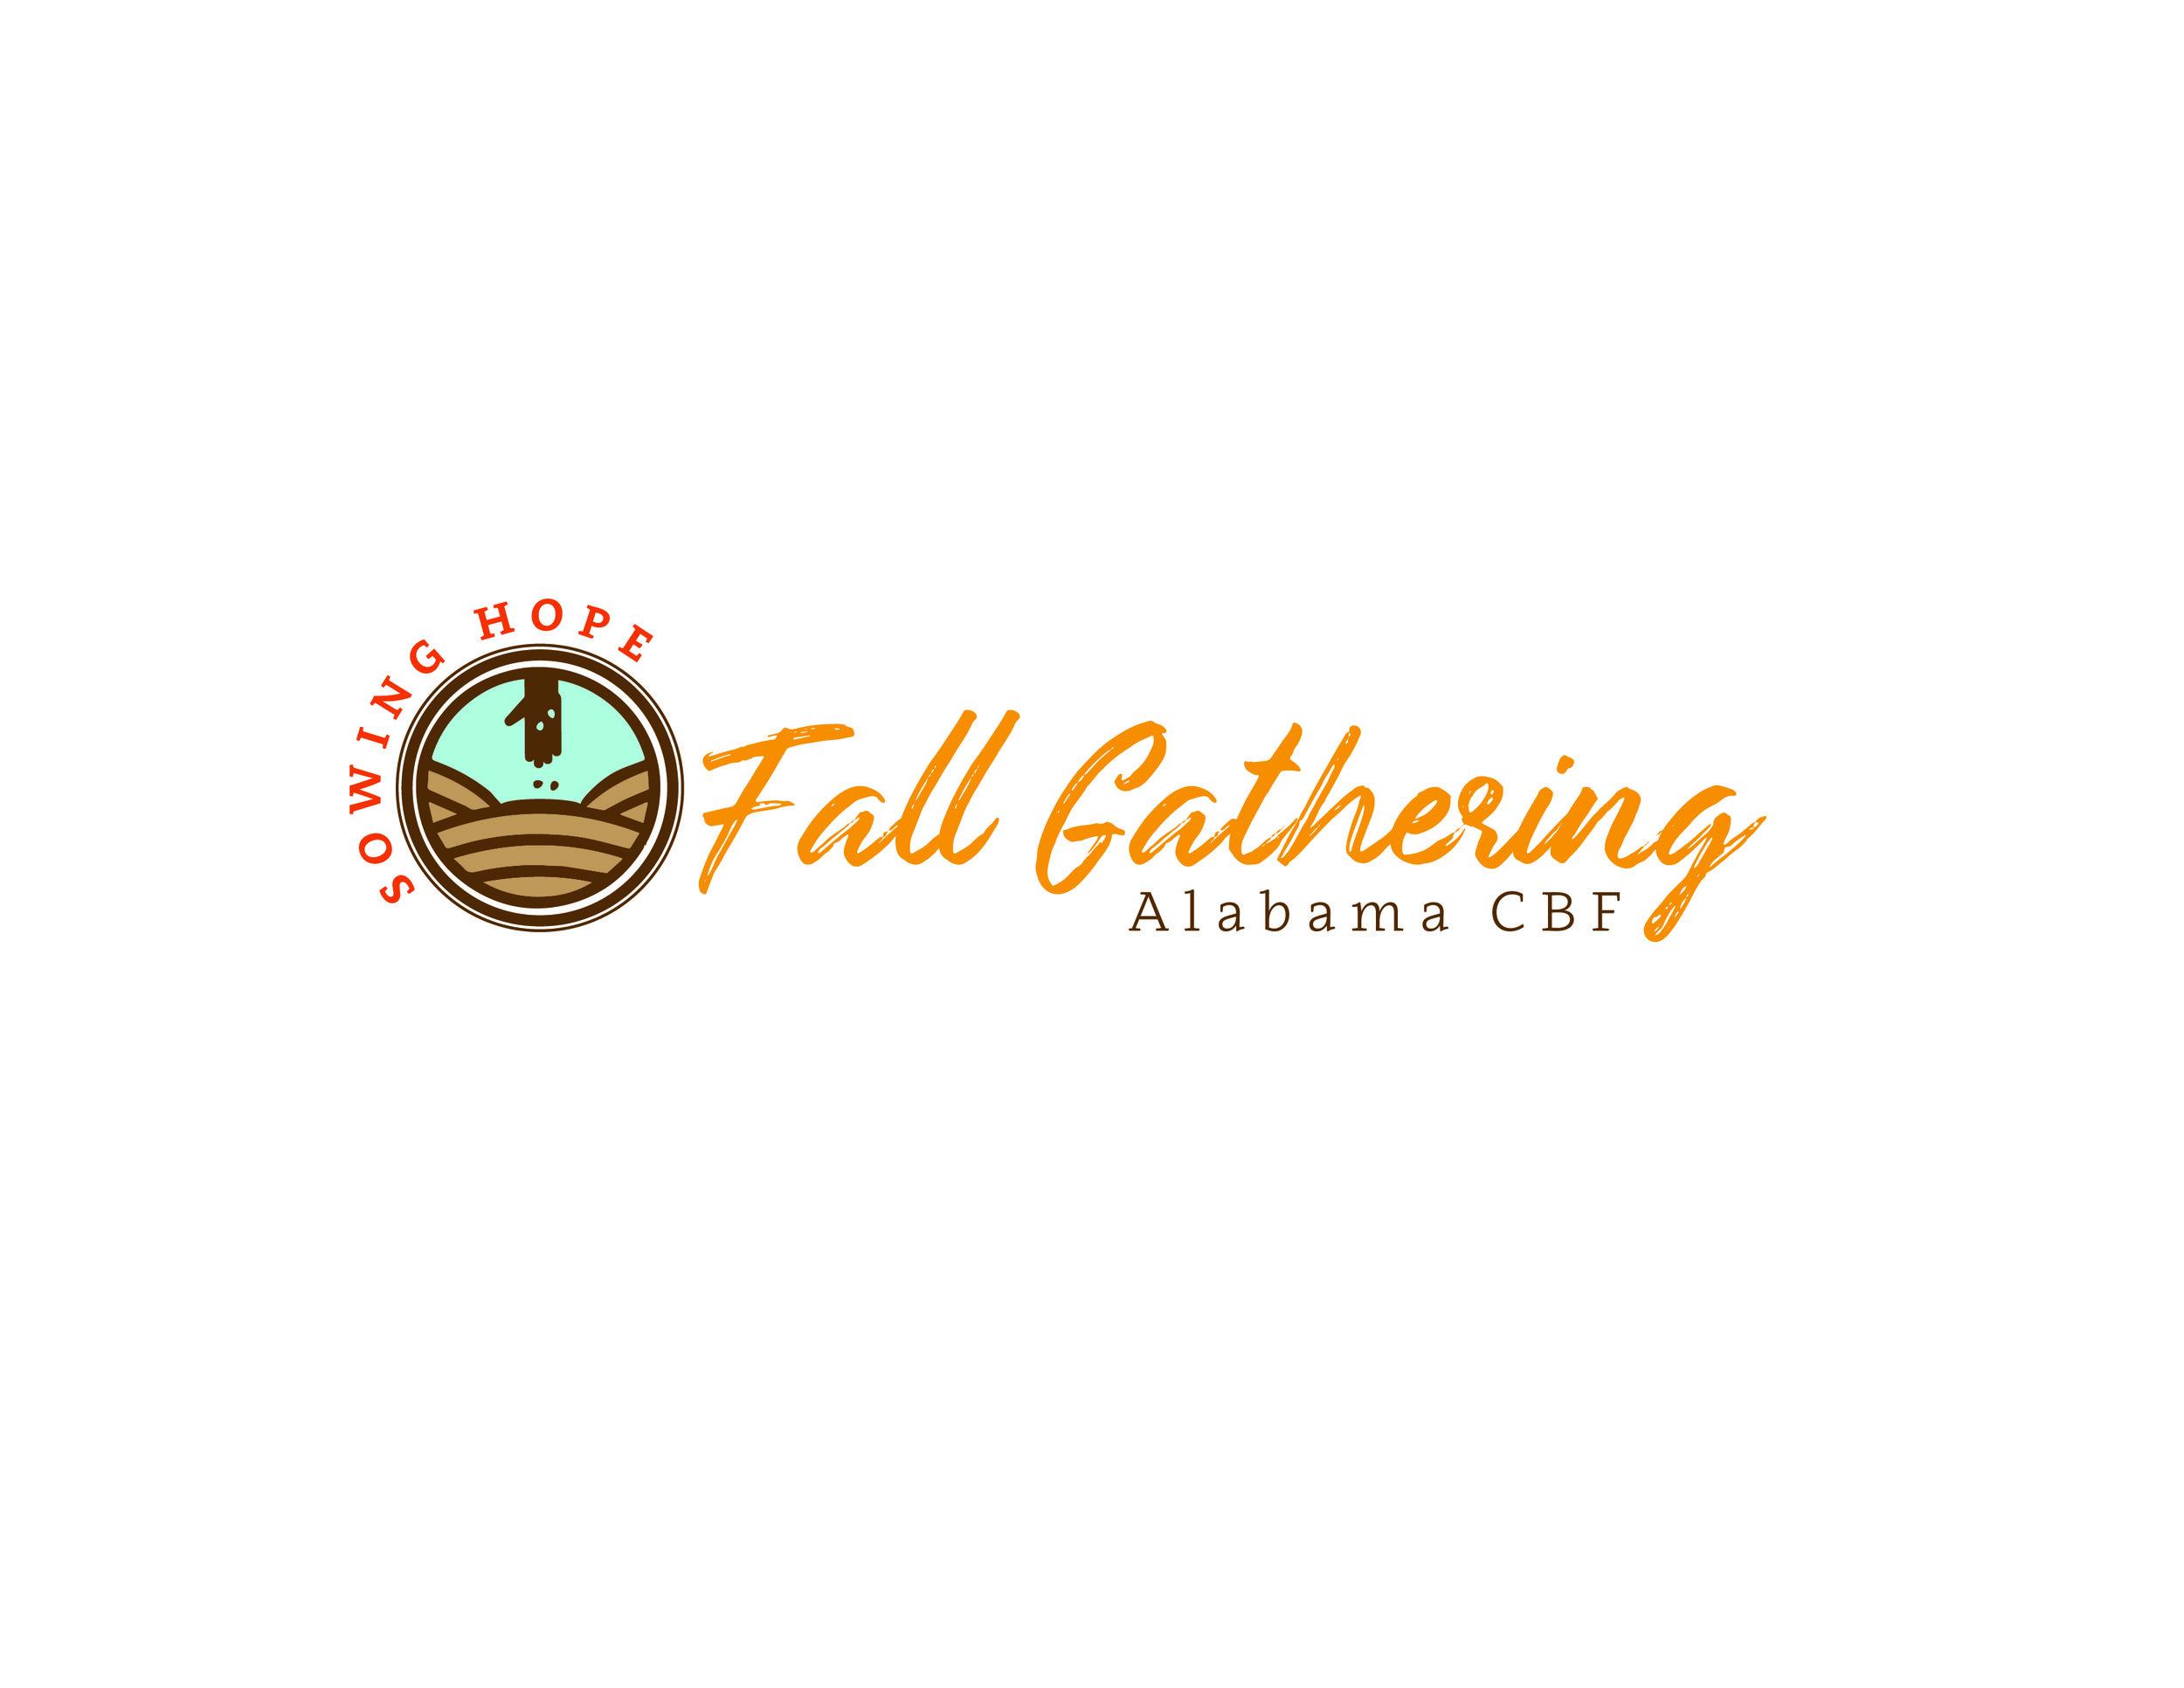 ALCBF_FallGathering_v2-01.jpg